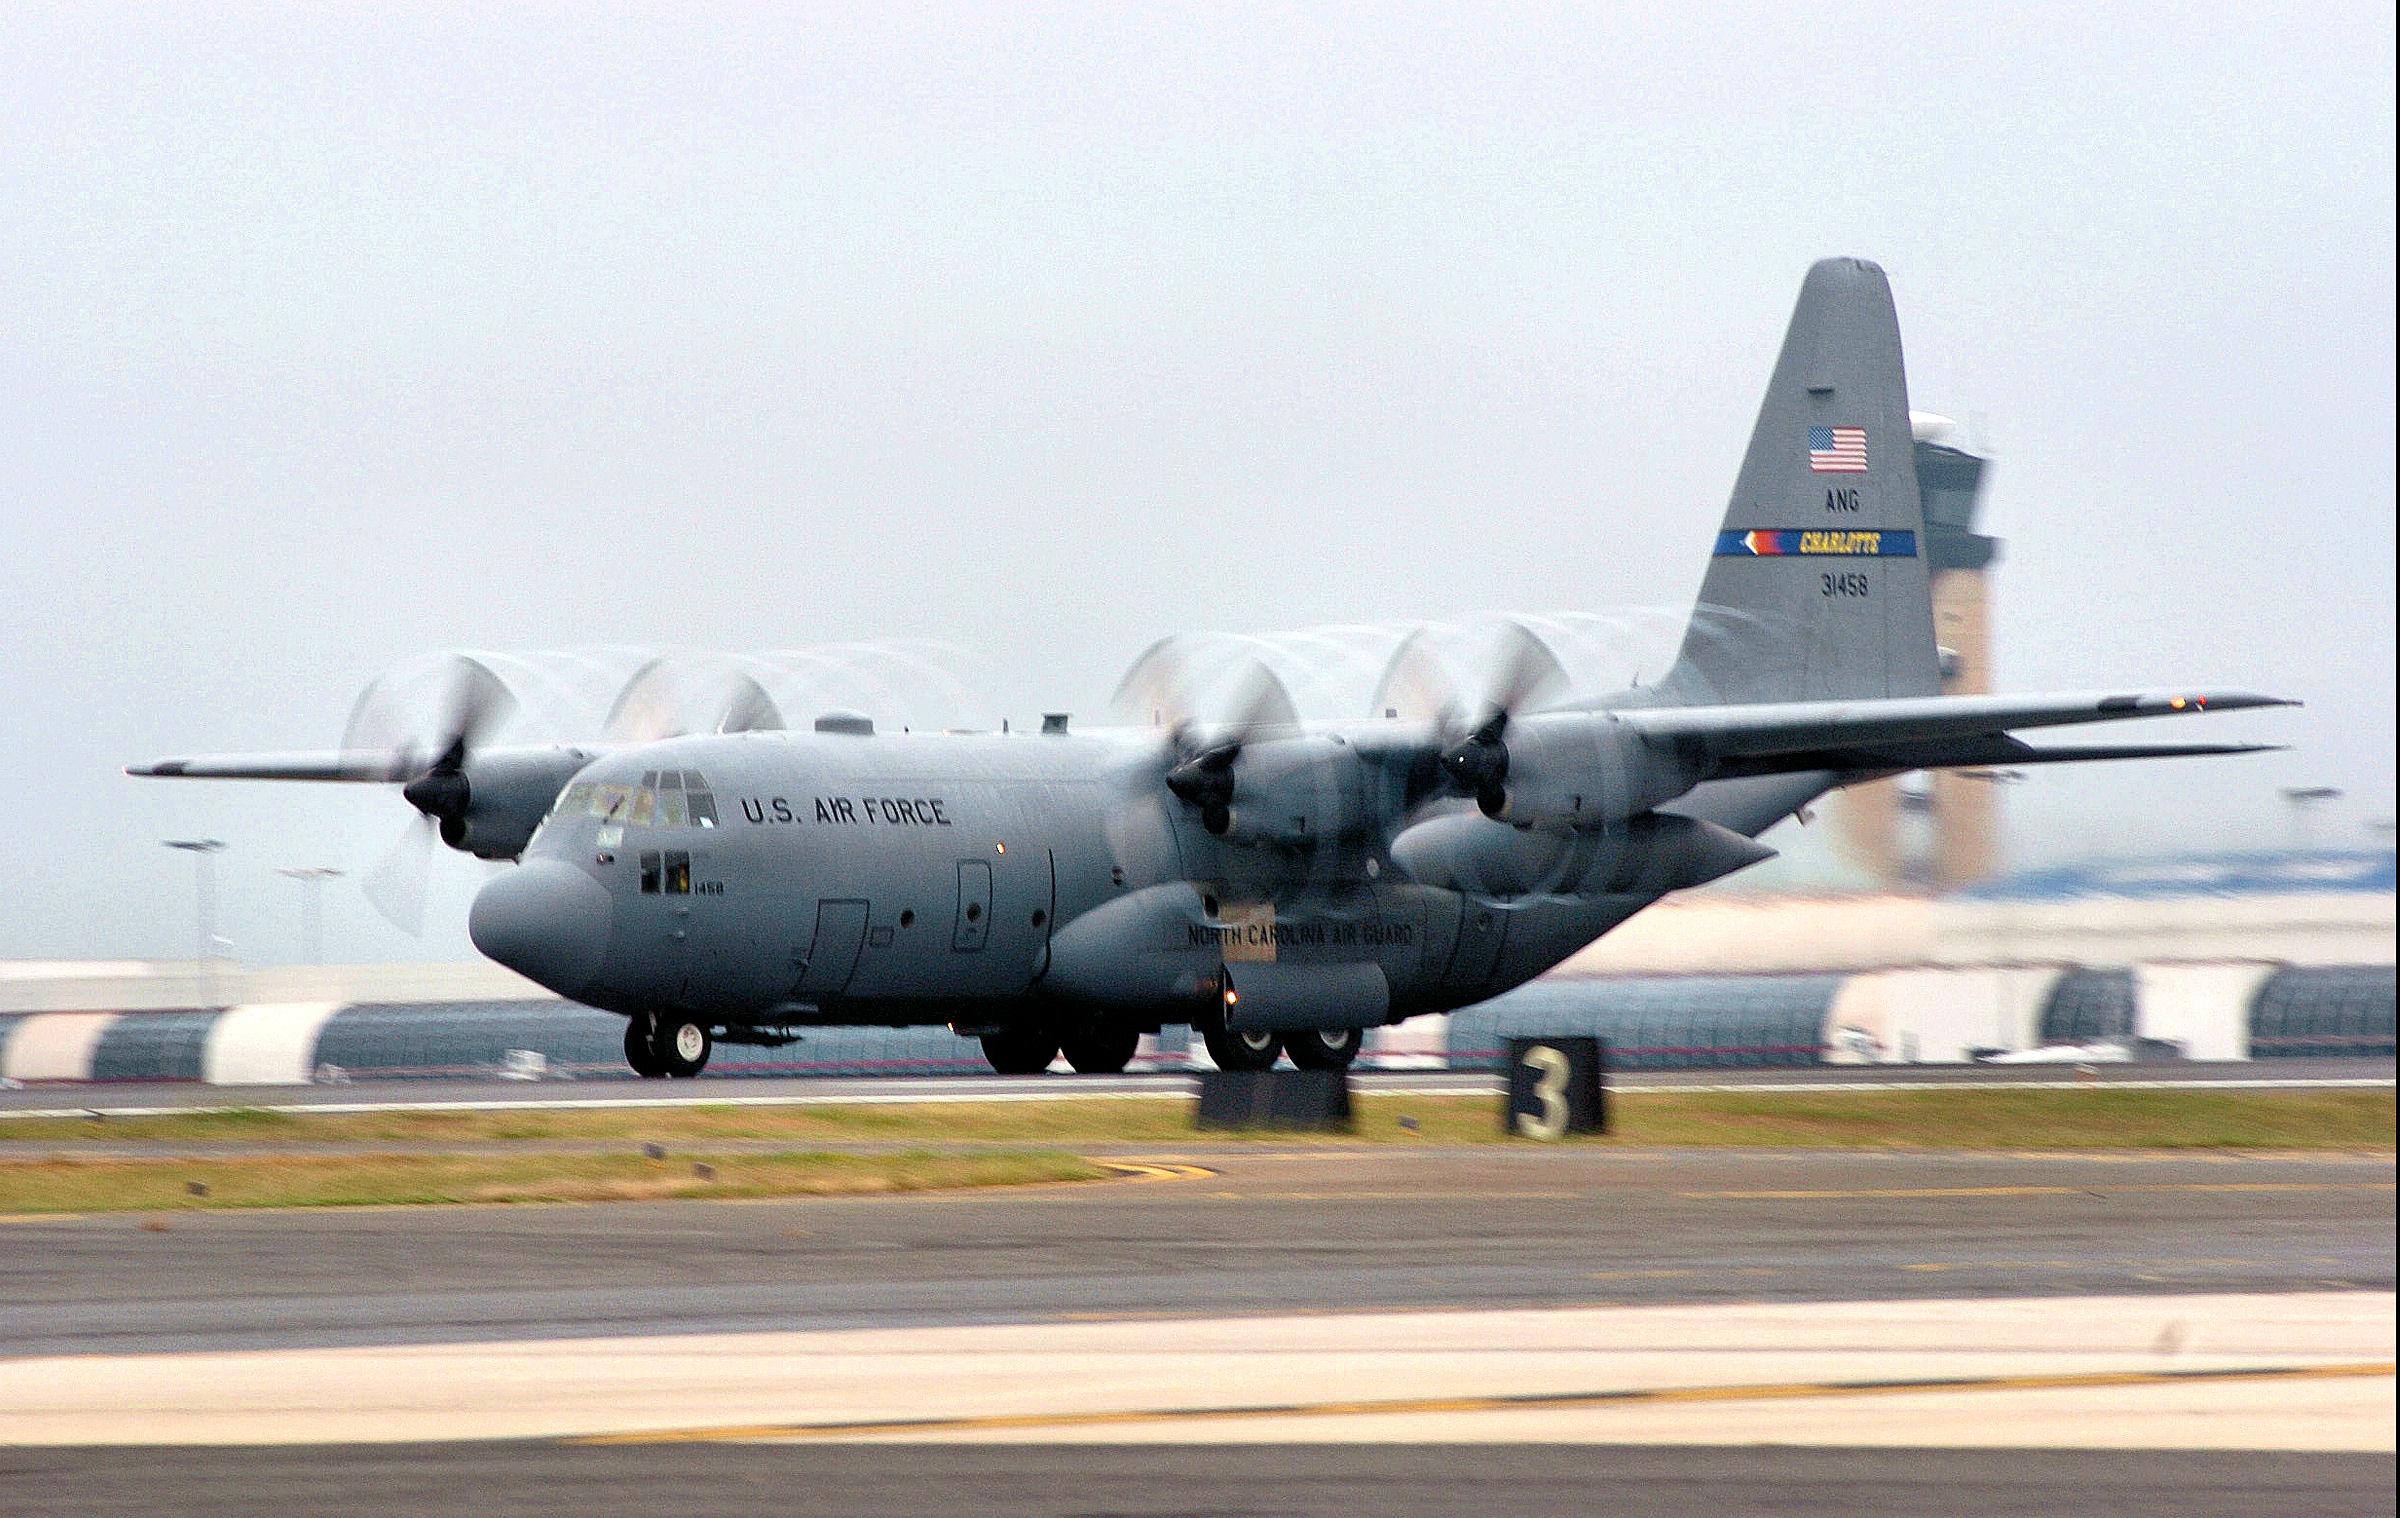 File:156th Airlift Squadron - Lockheed C-130H Hercules 93-1458.jpg